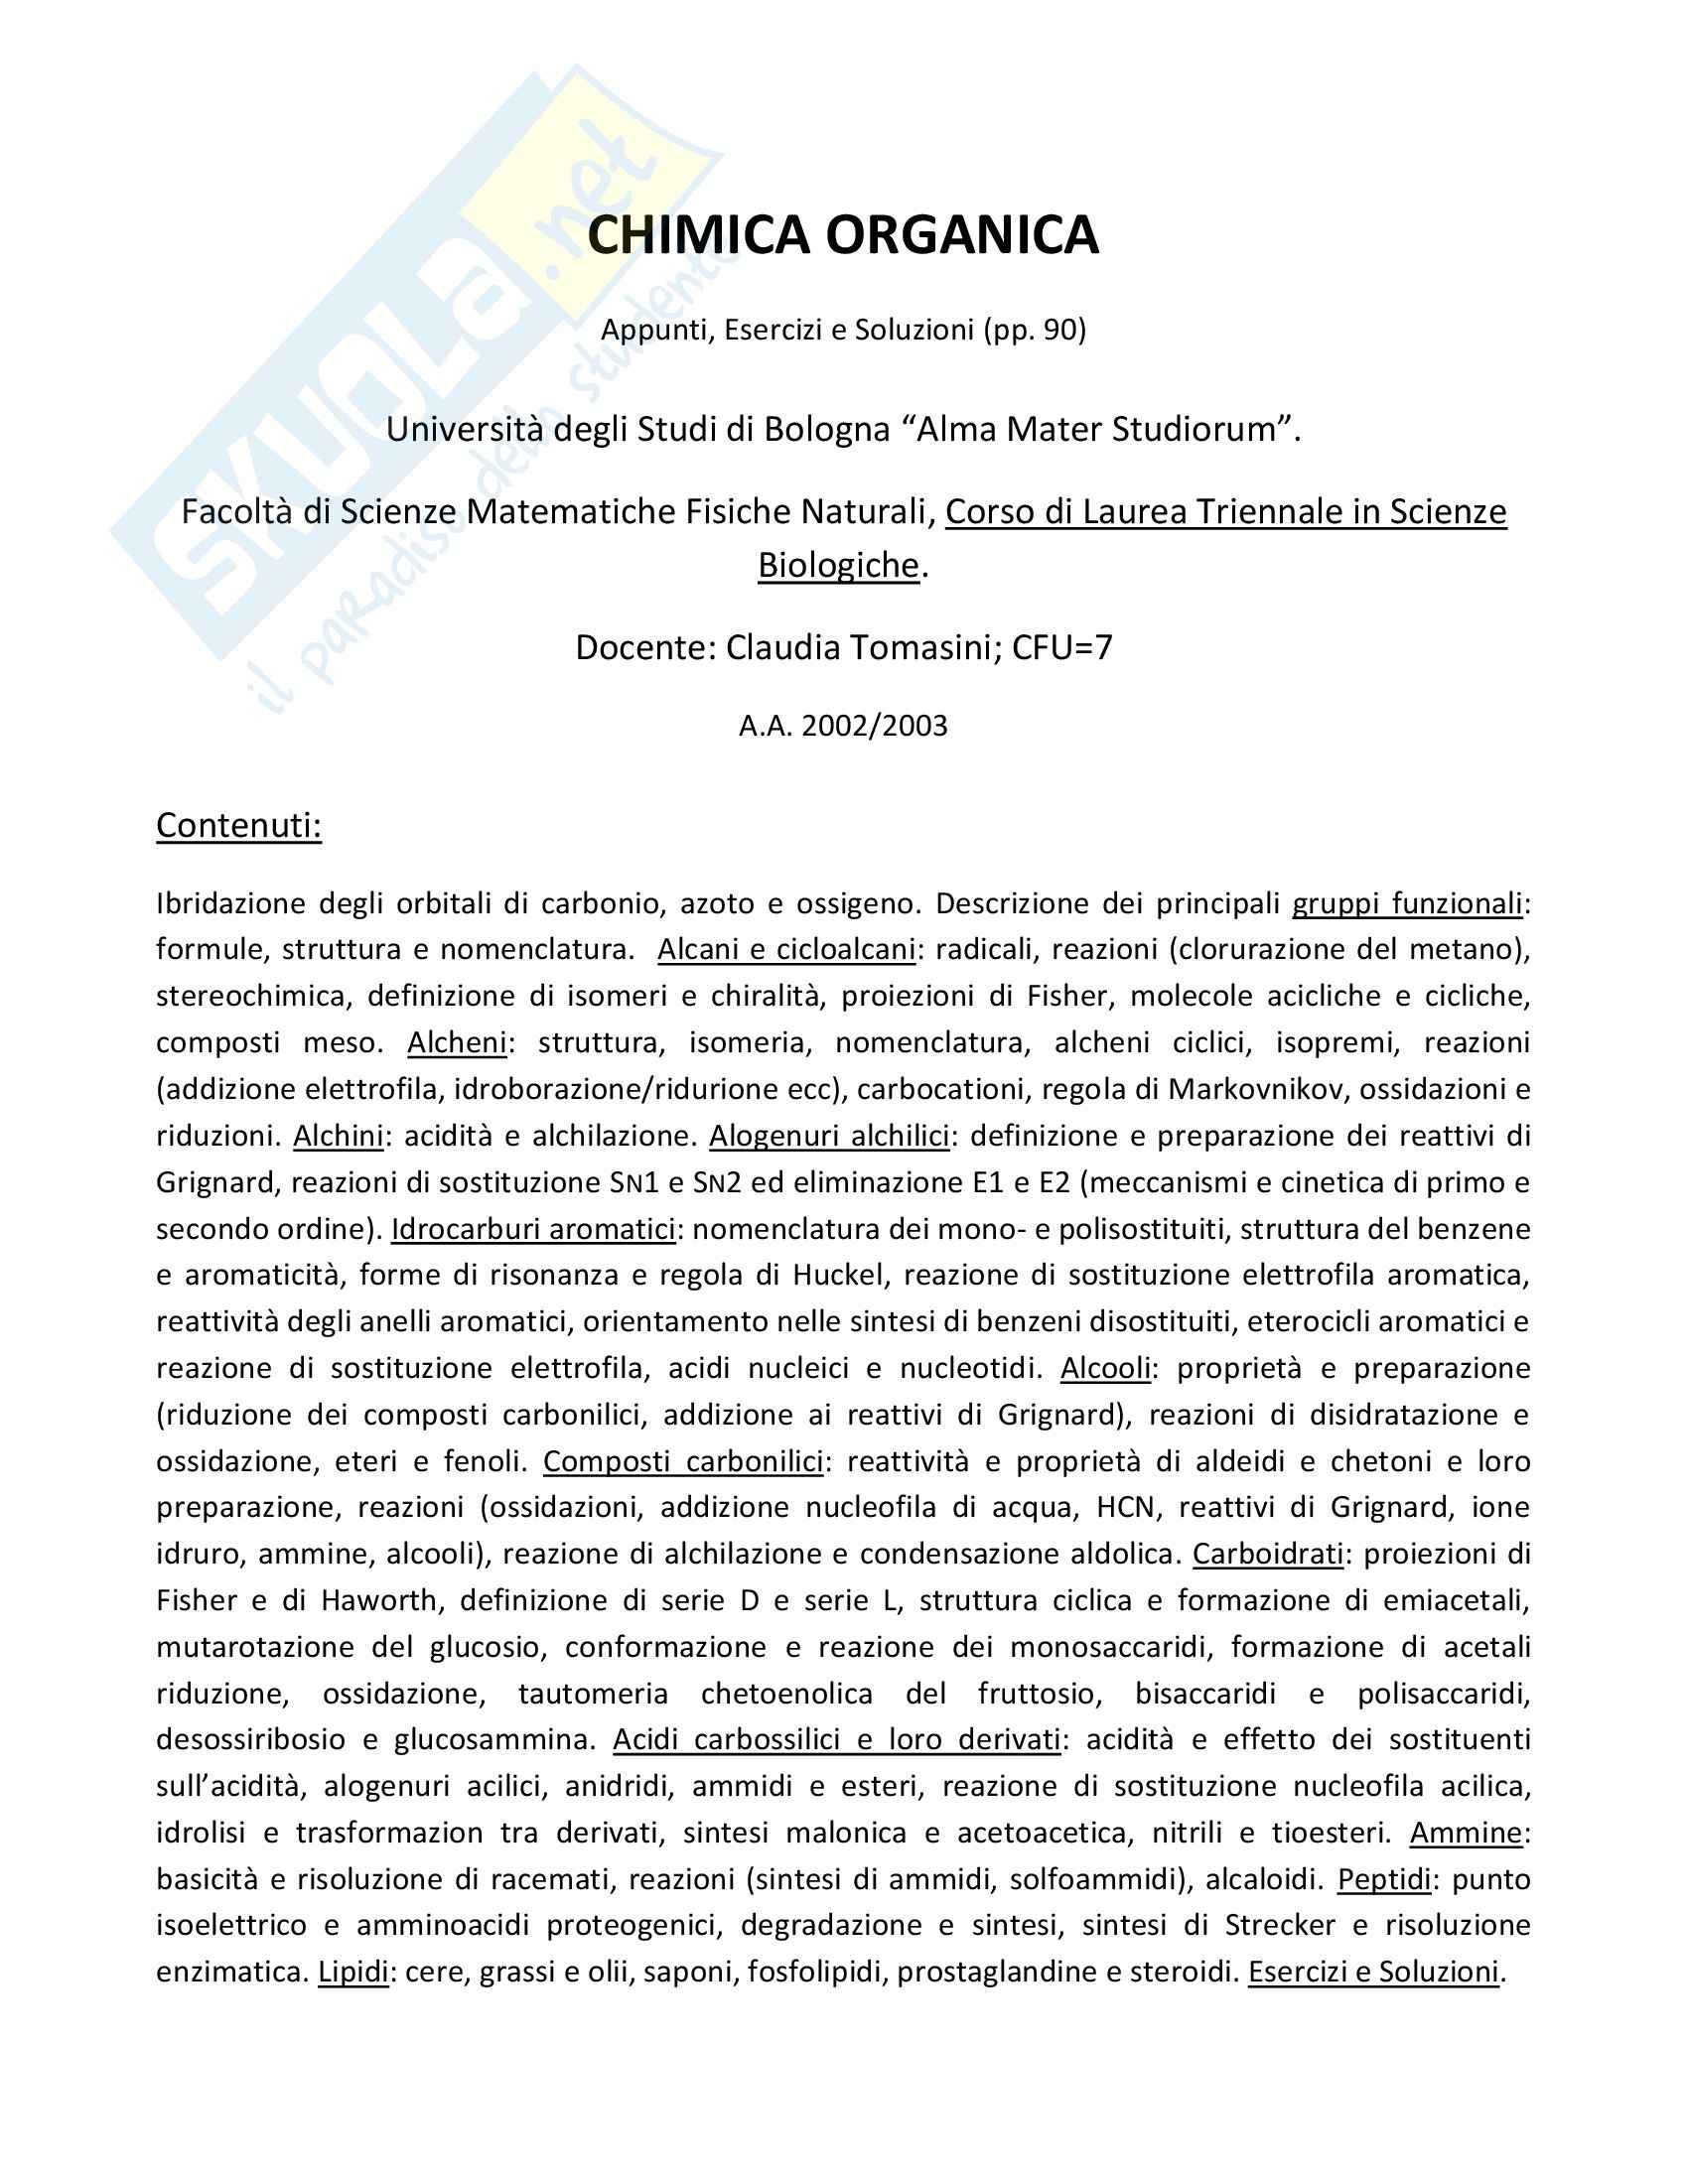 appunto C. Tomasini Chimica organica